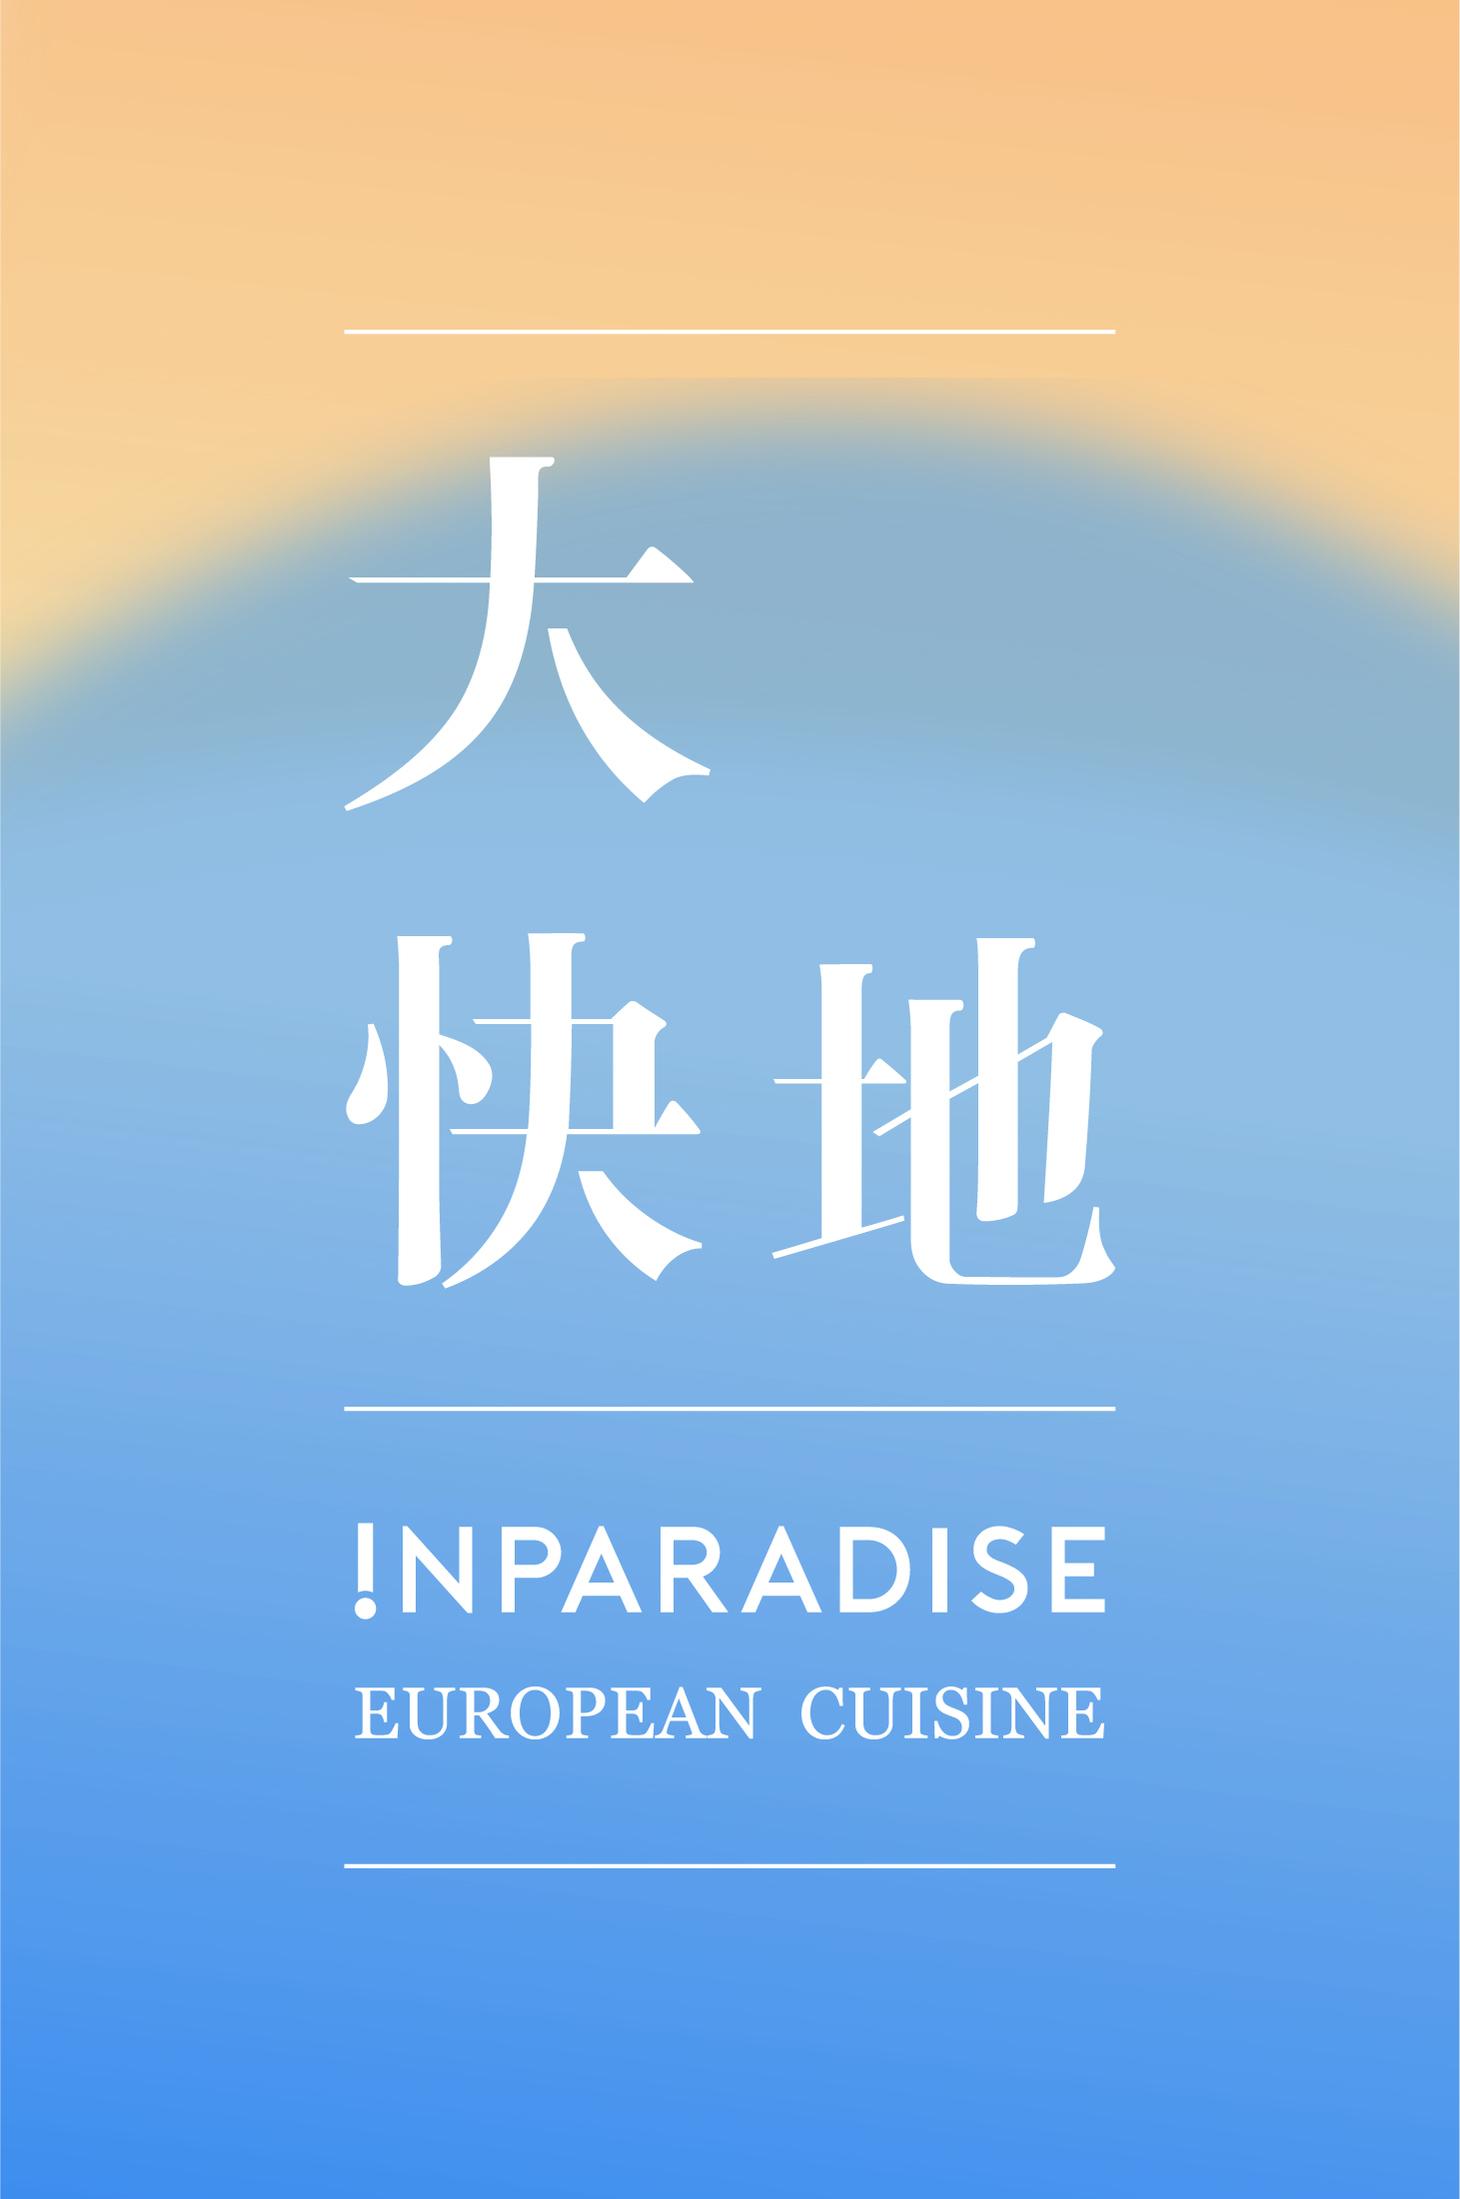 INPARADISE_12.jpg